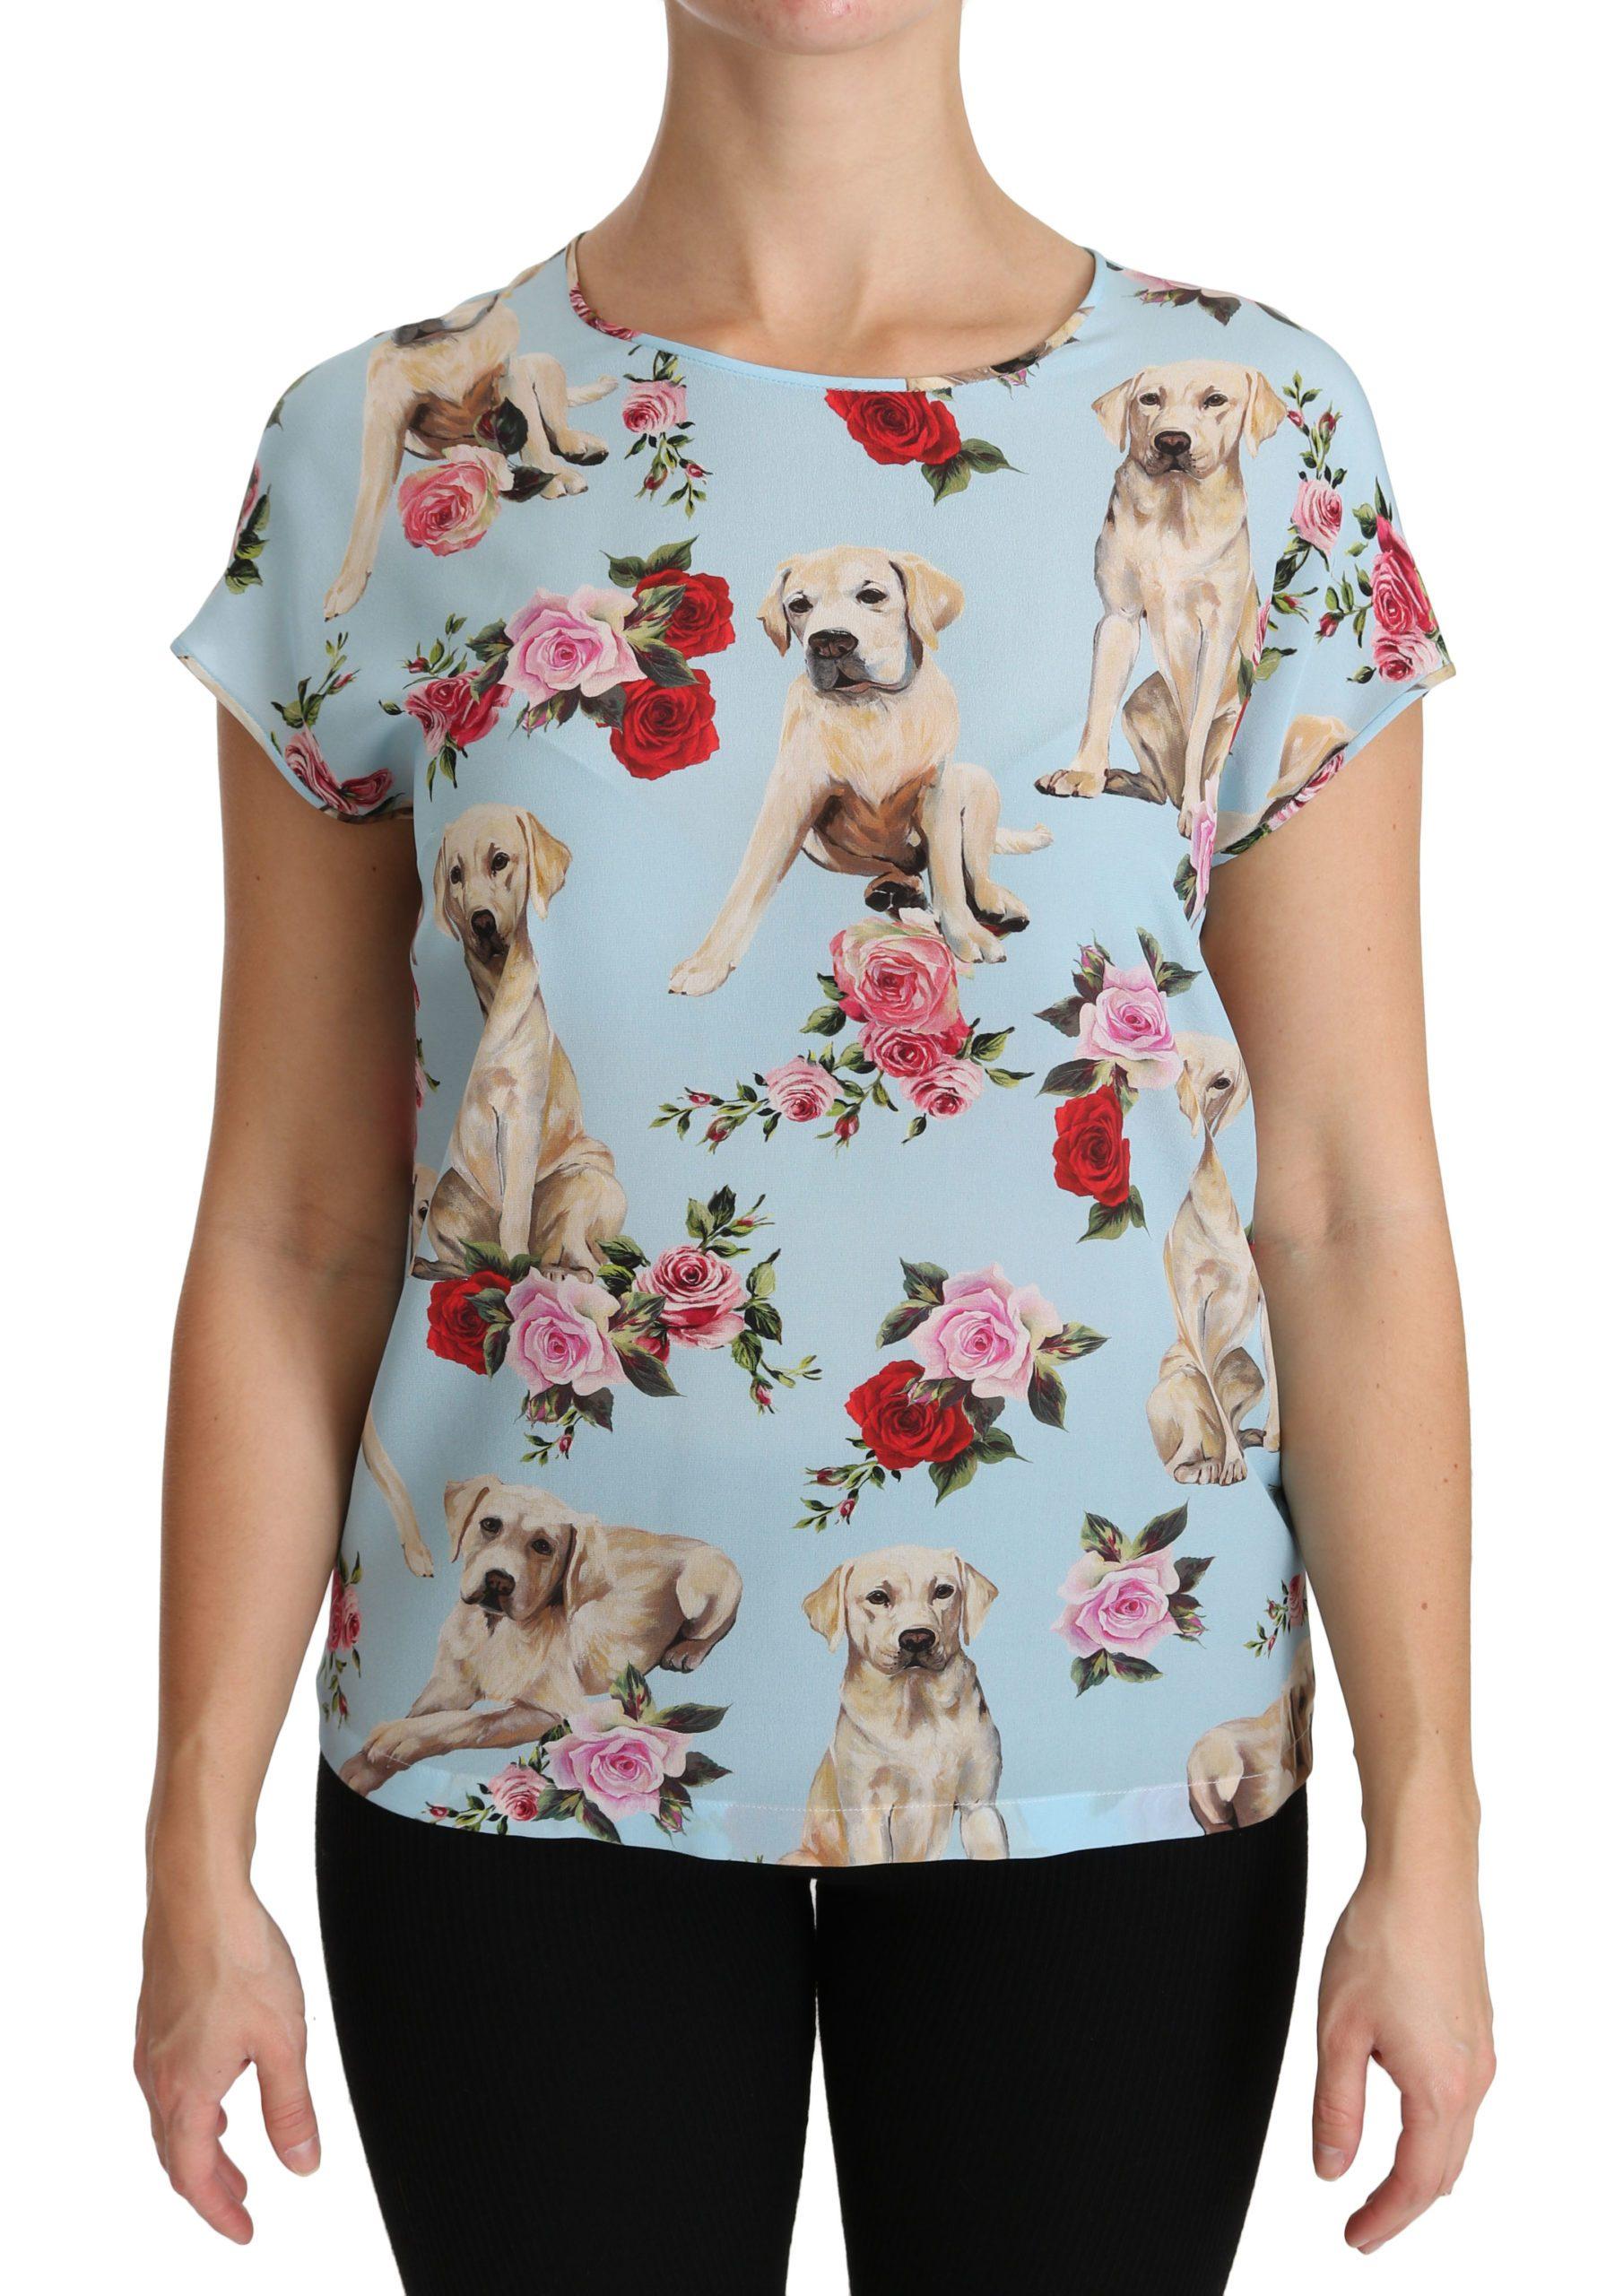 Dolce & Gabbana Women's Silk Short sleeve Tops Blue TSH4299 - IT40|S